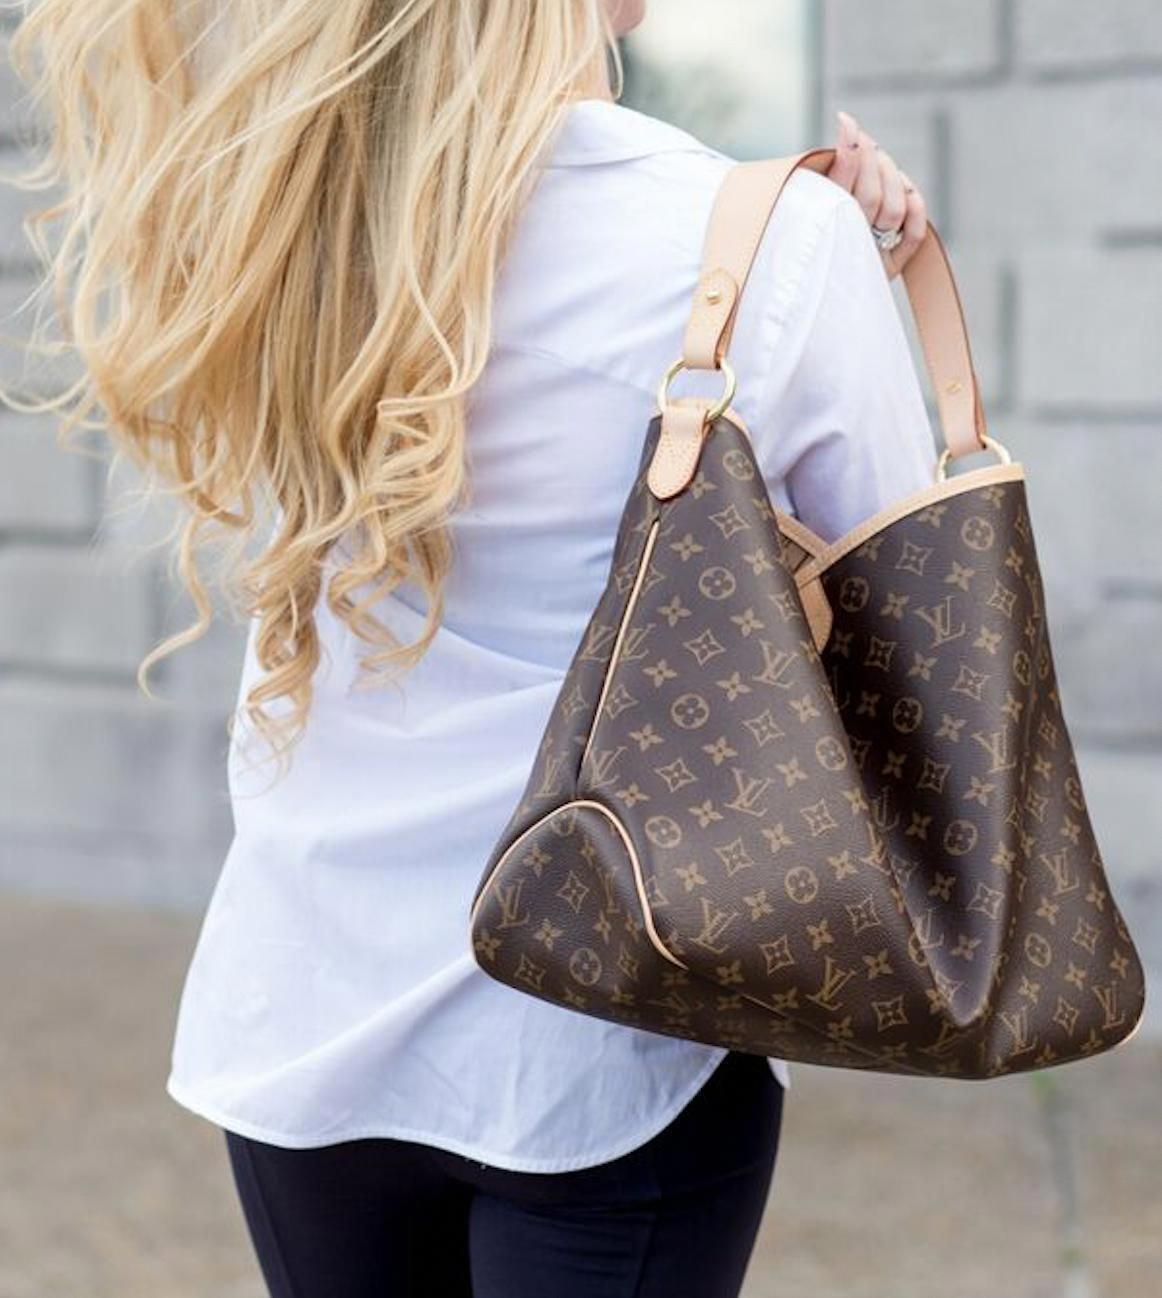 4495ed7febf6 Louis Vuitton Delightful MM - Beautiful luxury bags sold on consignment.   Louisvuittonhandbags